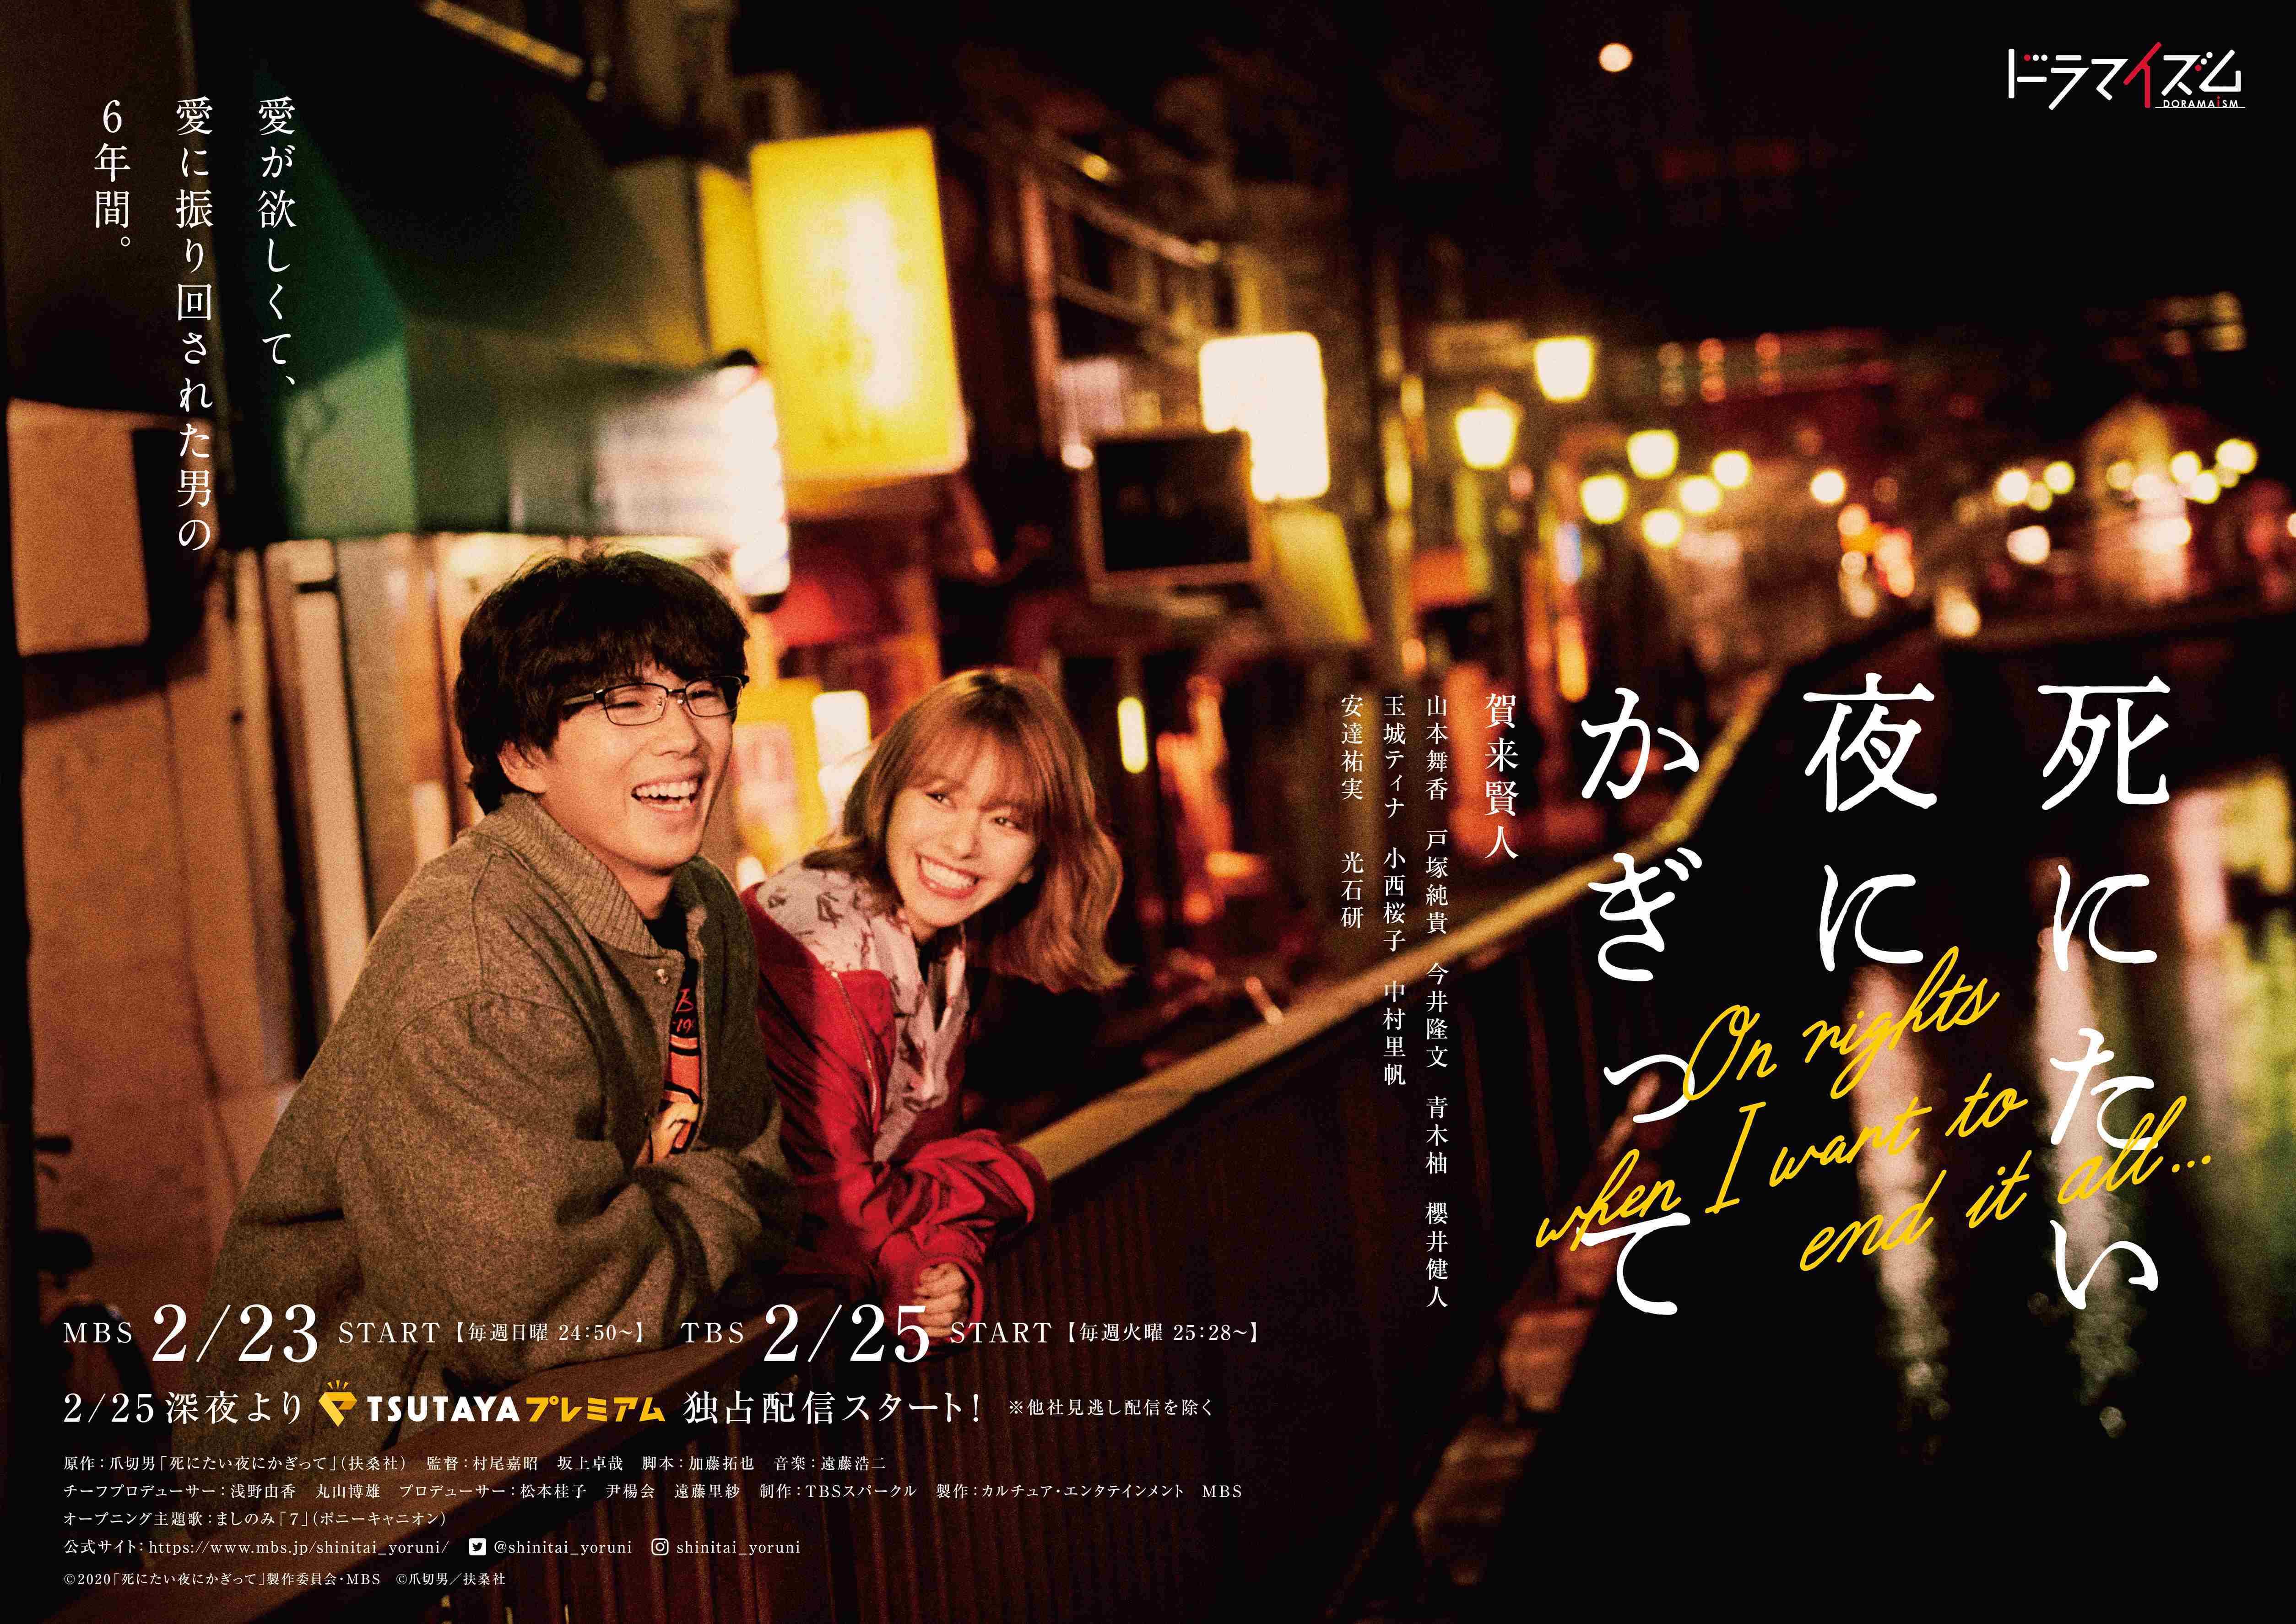 (C)2020「死にたい夜にかぎって」製作委員会・MBS (C)爪切男/扶桑社